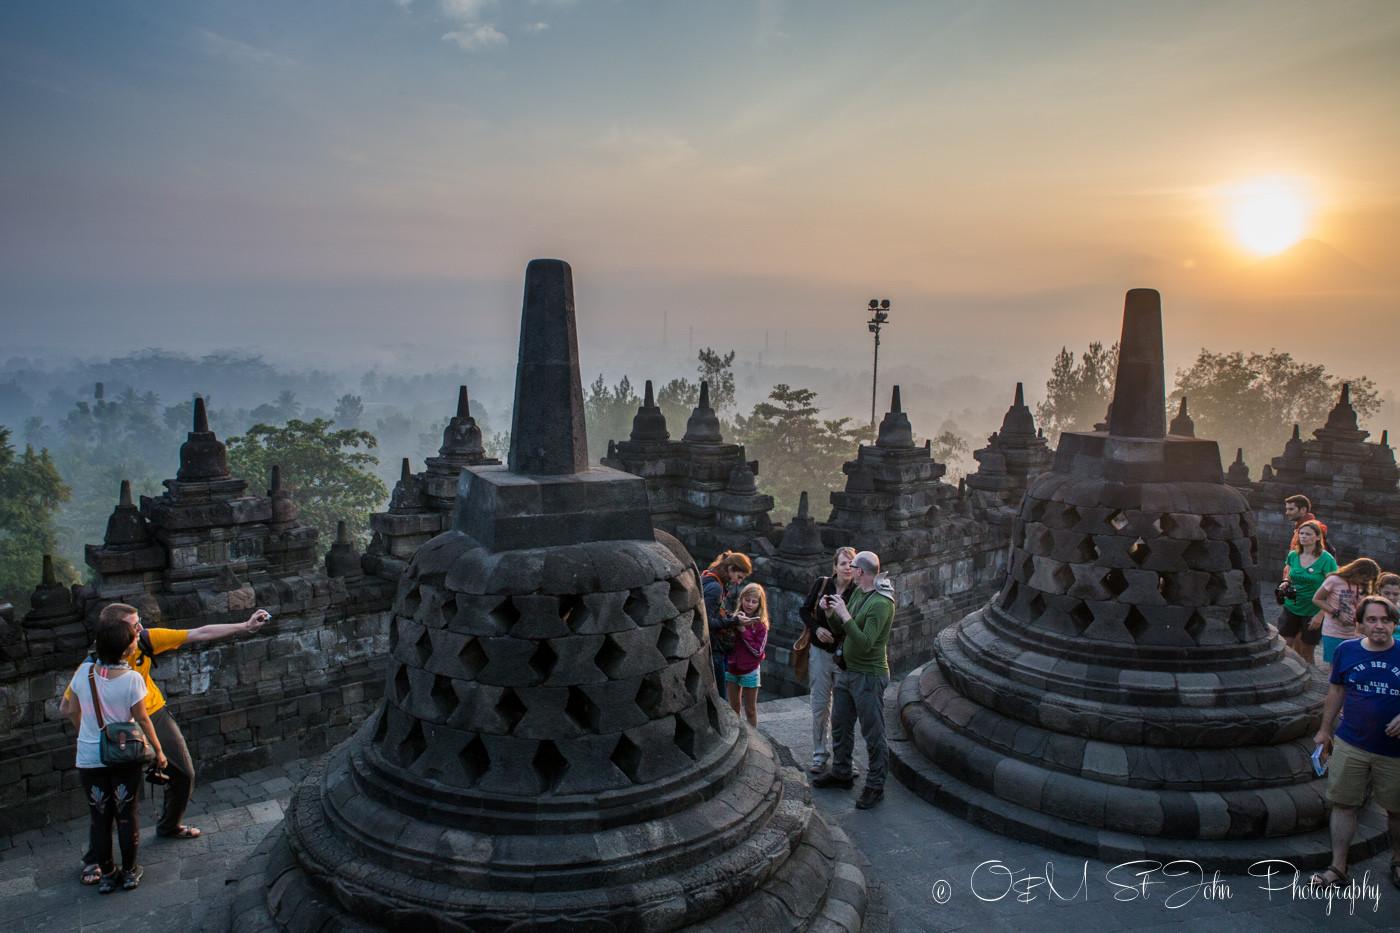 Crowds at Borobudur Temple. Central Java, Indonesia